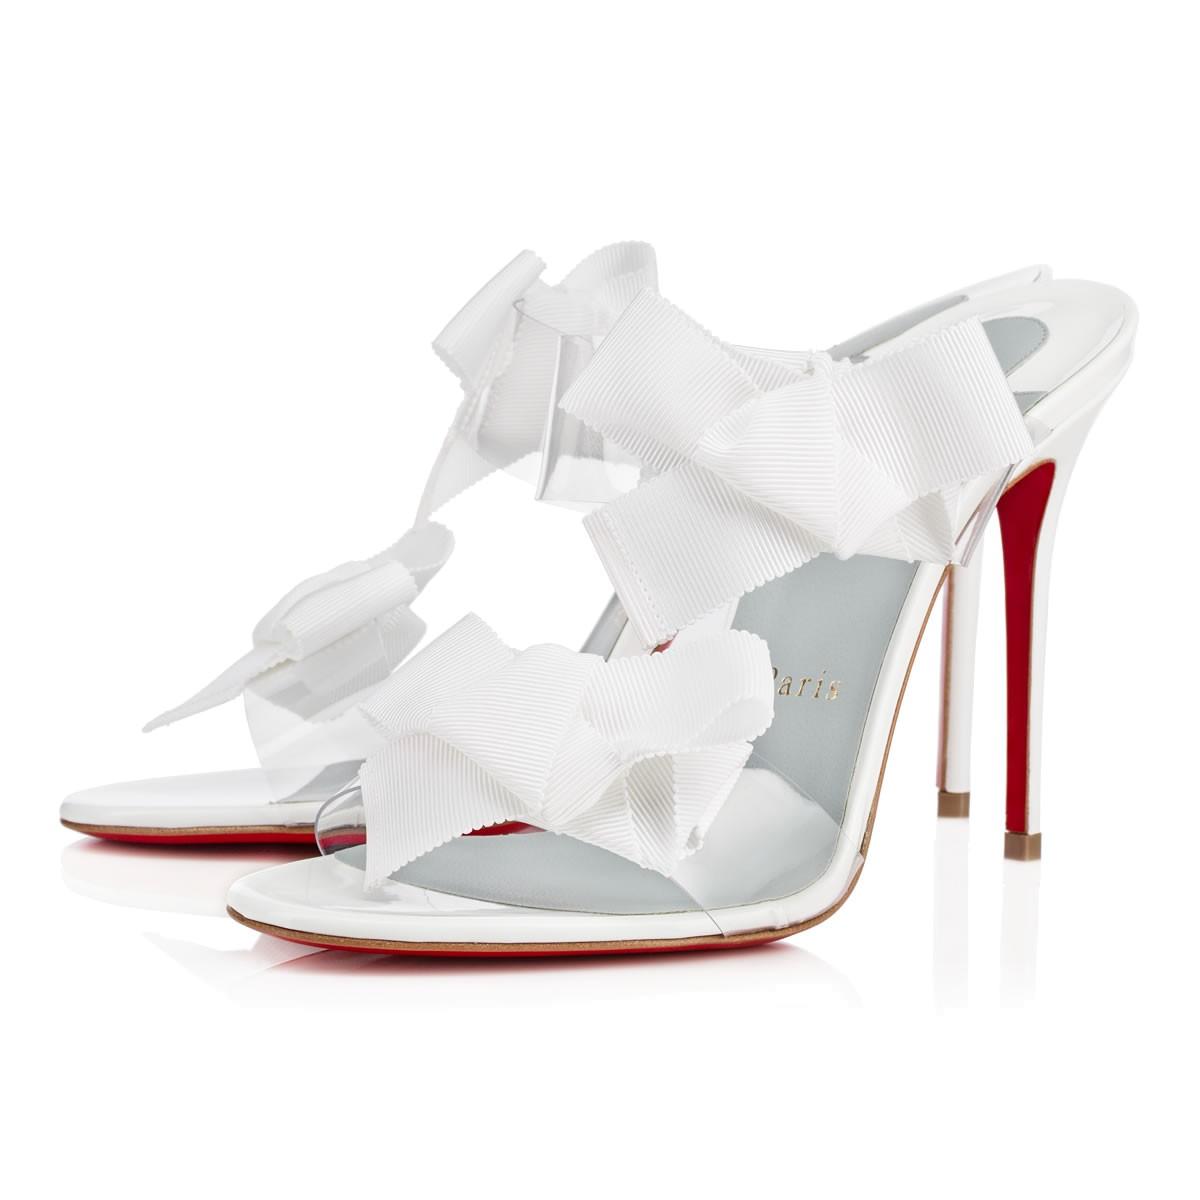 christian louboutin-delicanodo-wedding shoes